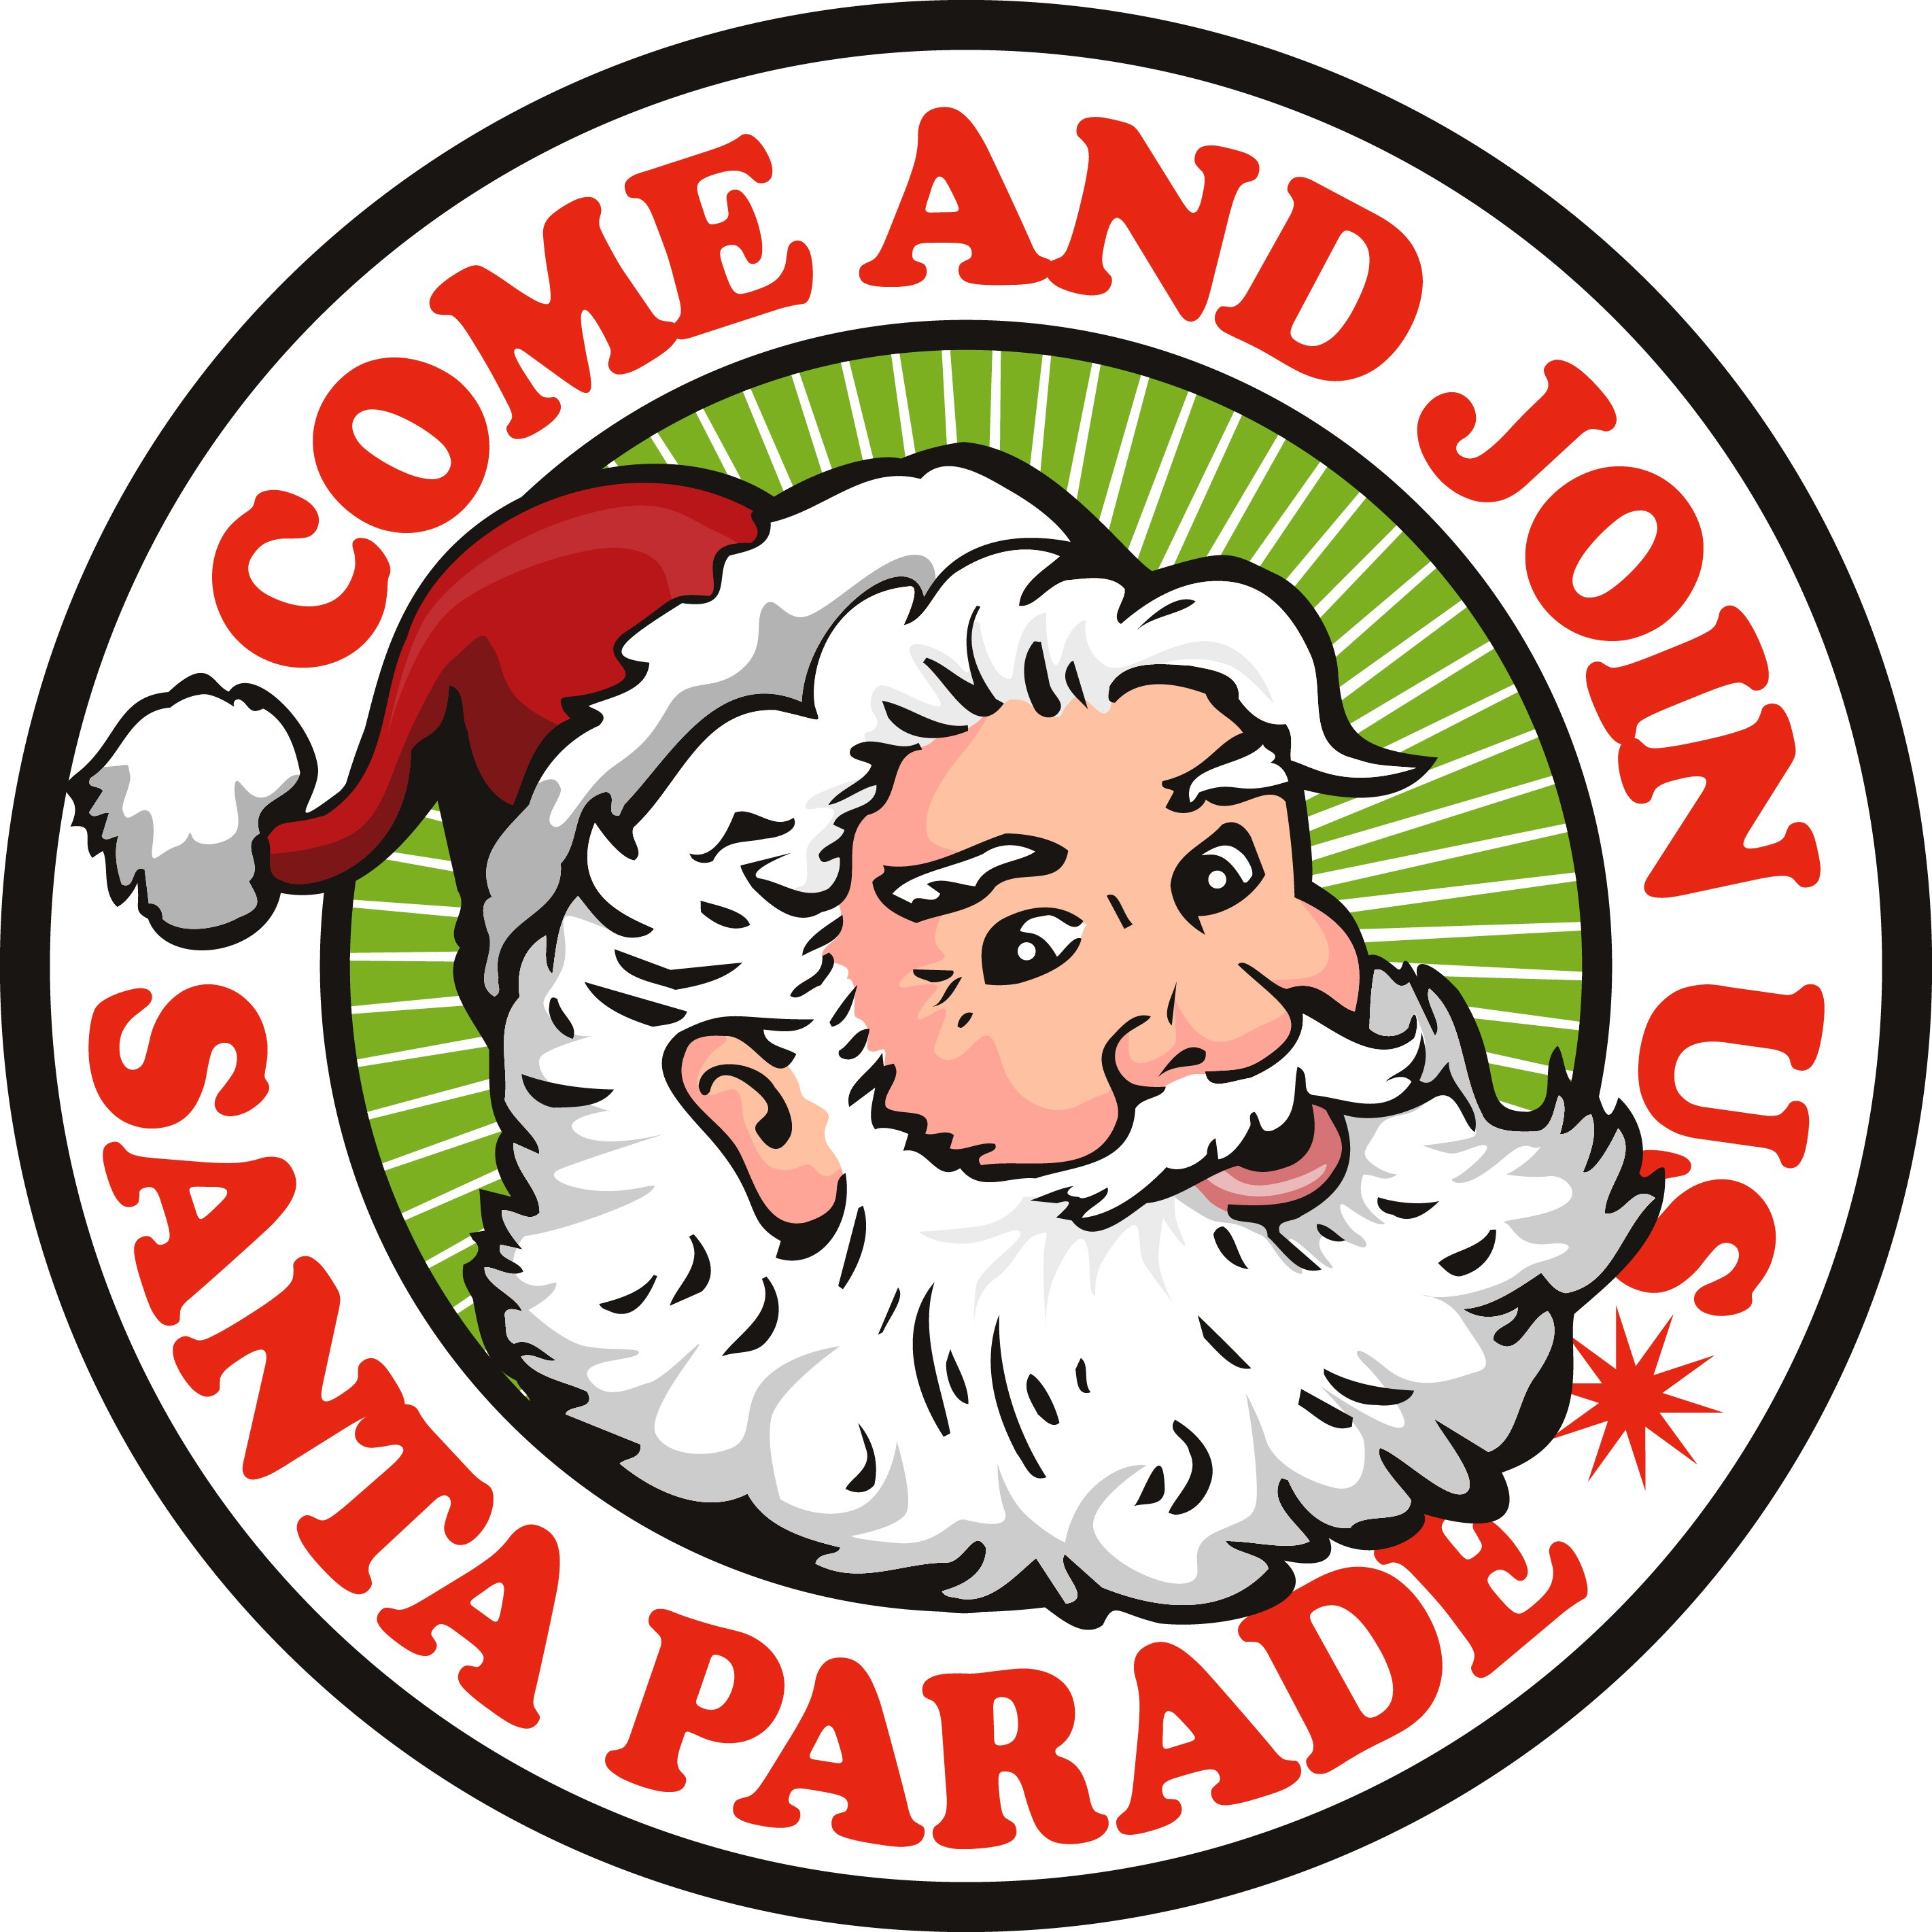 2842x2842 Clip Art Of Christmas Parade Events City Harrington Kent County